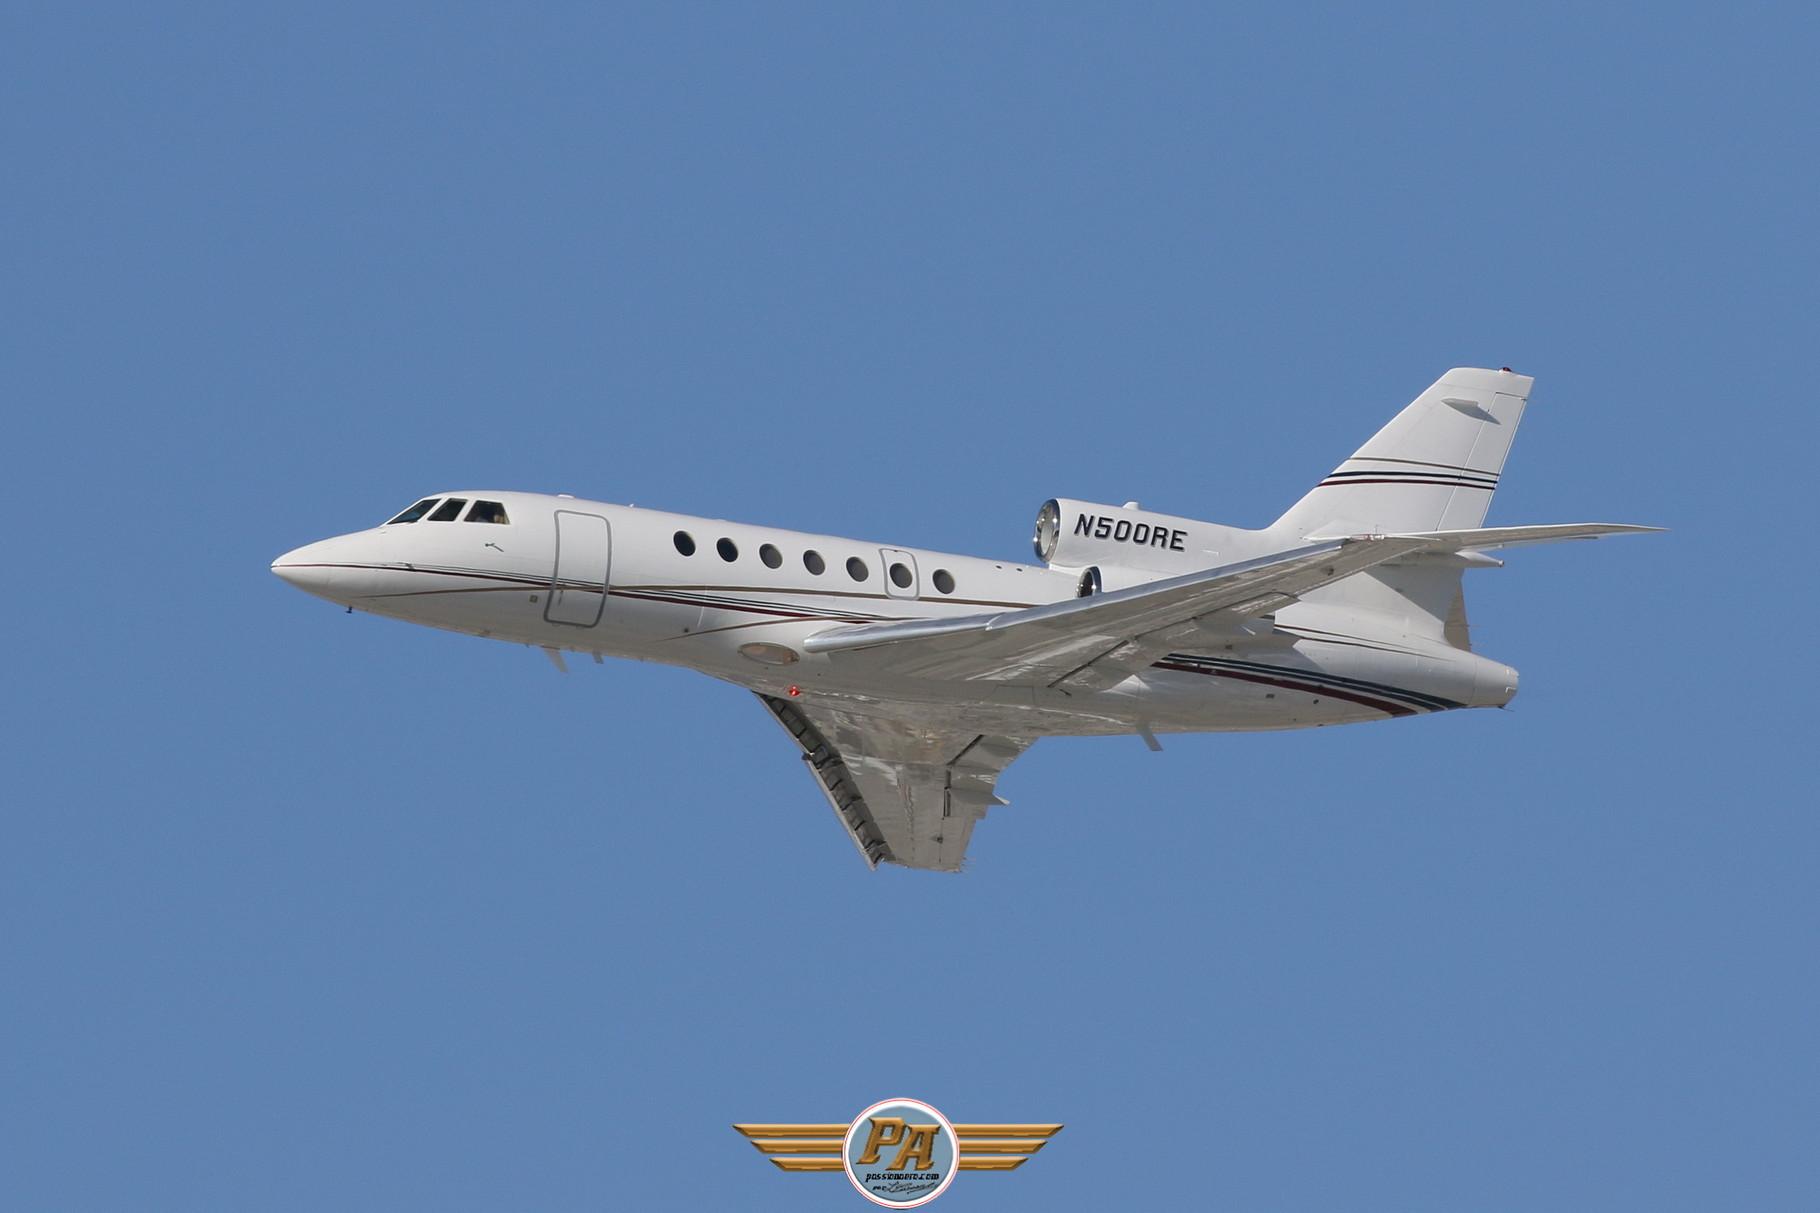 Dassault Falcon 50 immatriculé N500RE